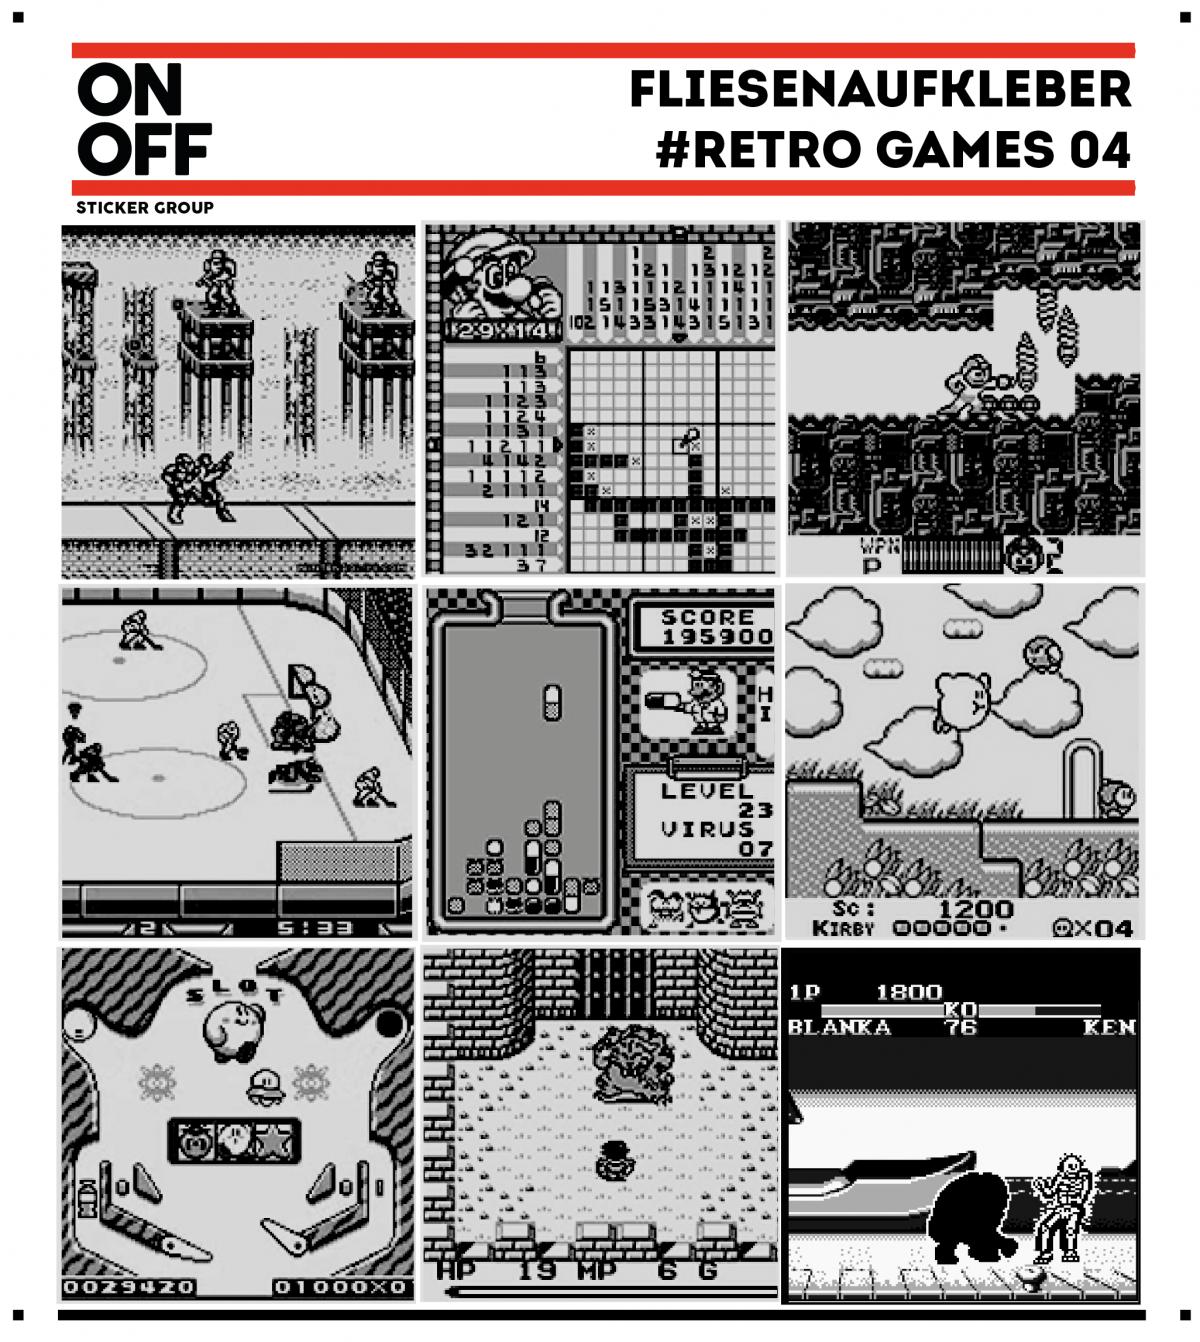 Fliesenaufkleber-retro-games-04